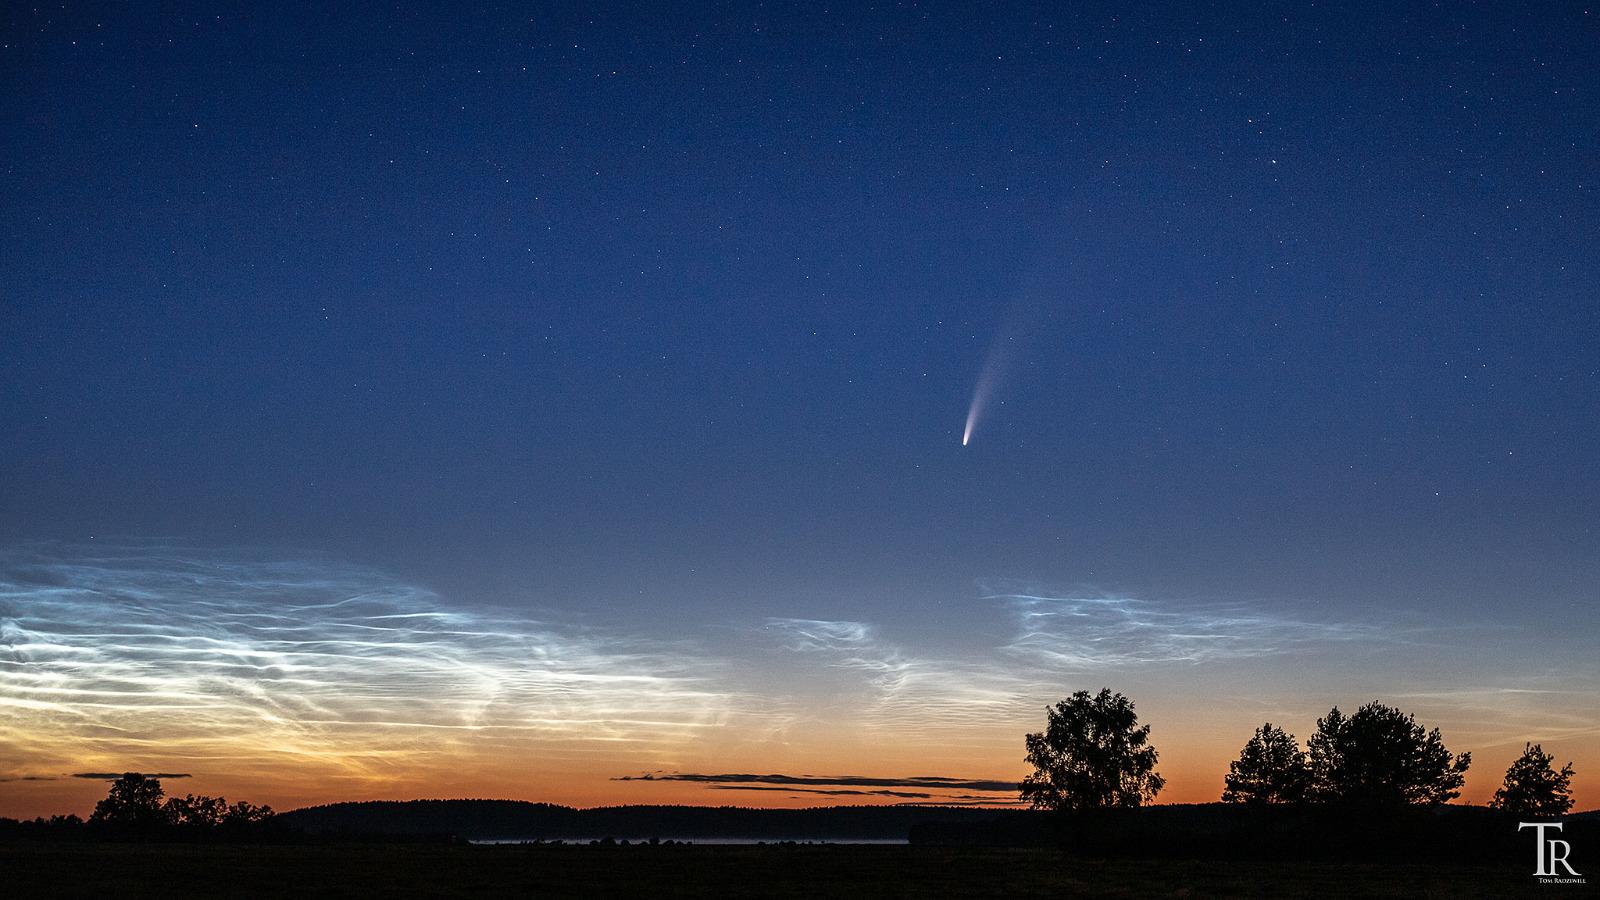 Komet NEOWISE über dem Westhavelland